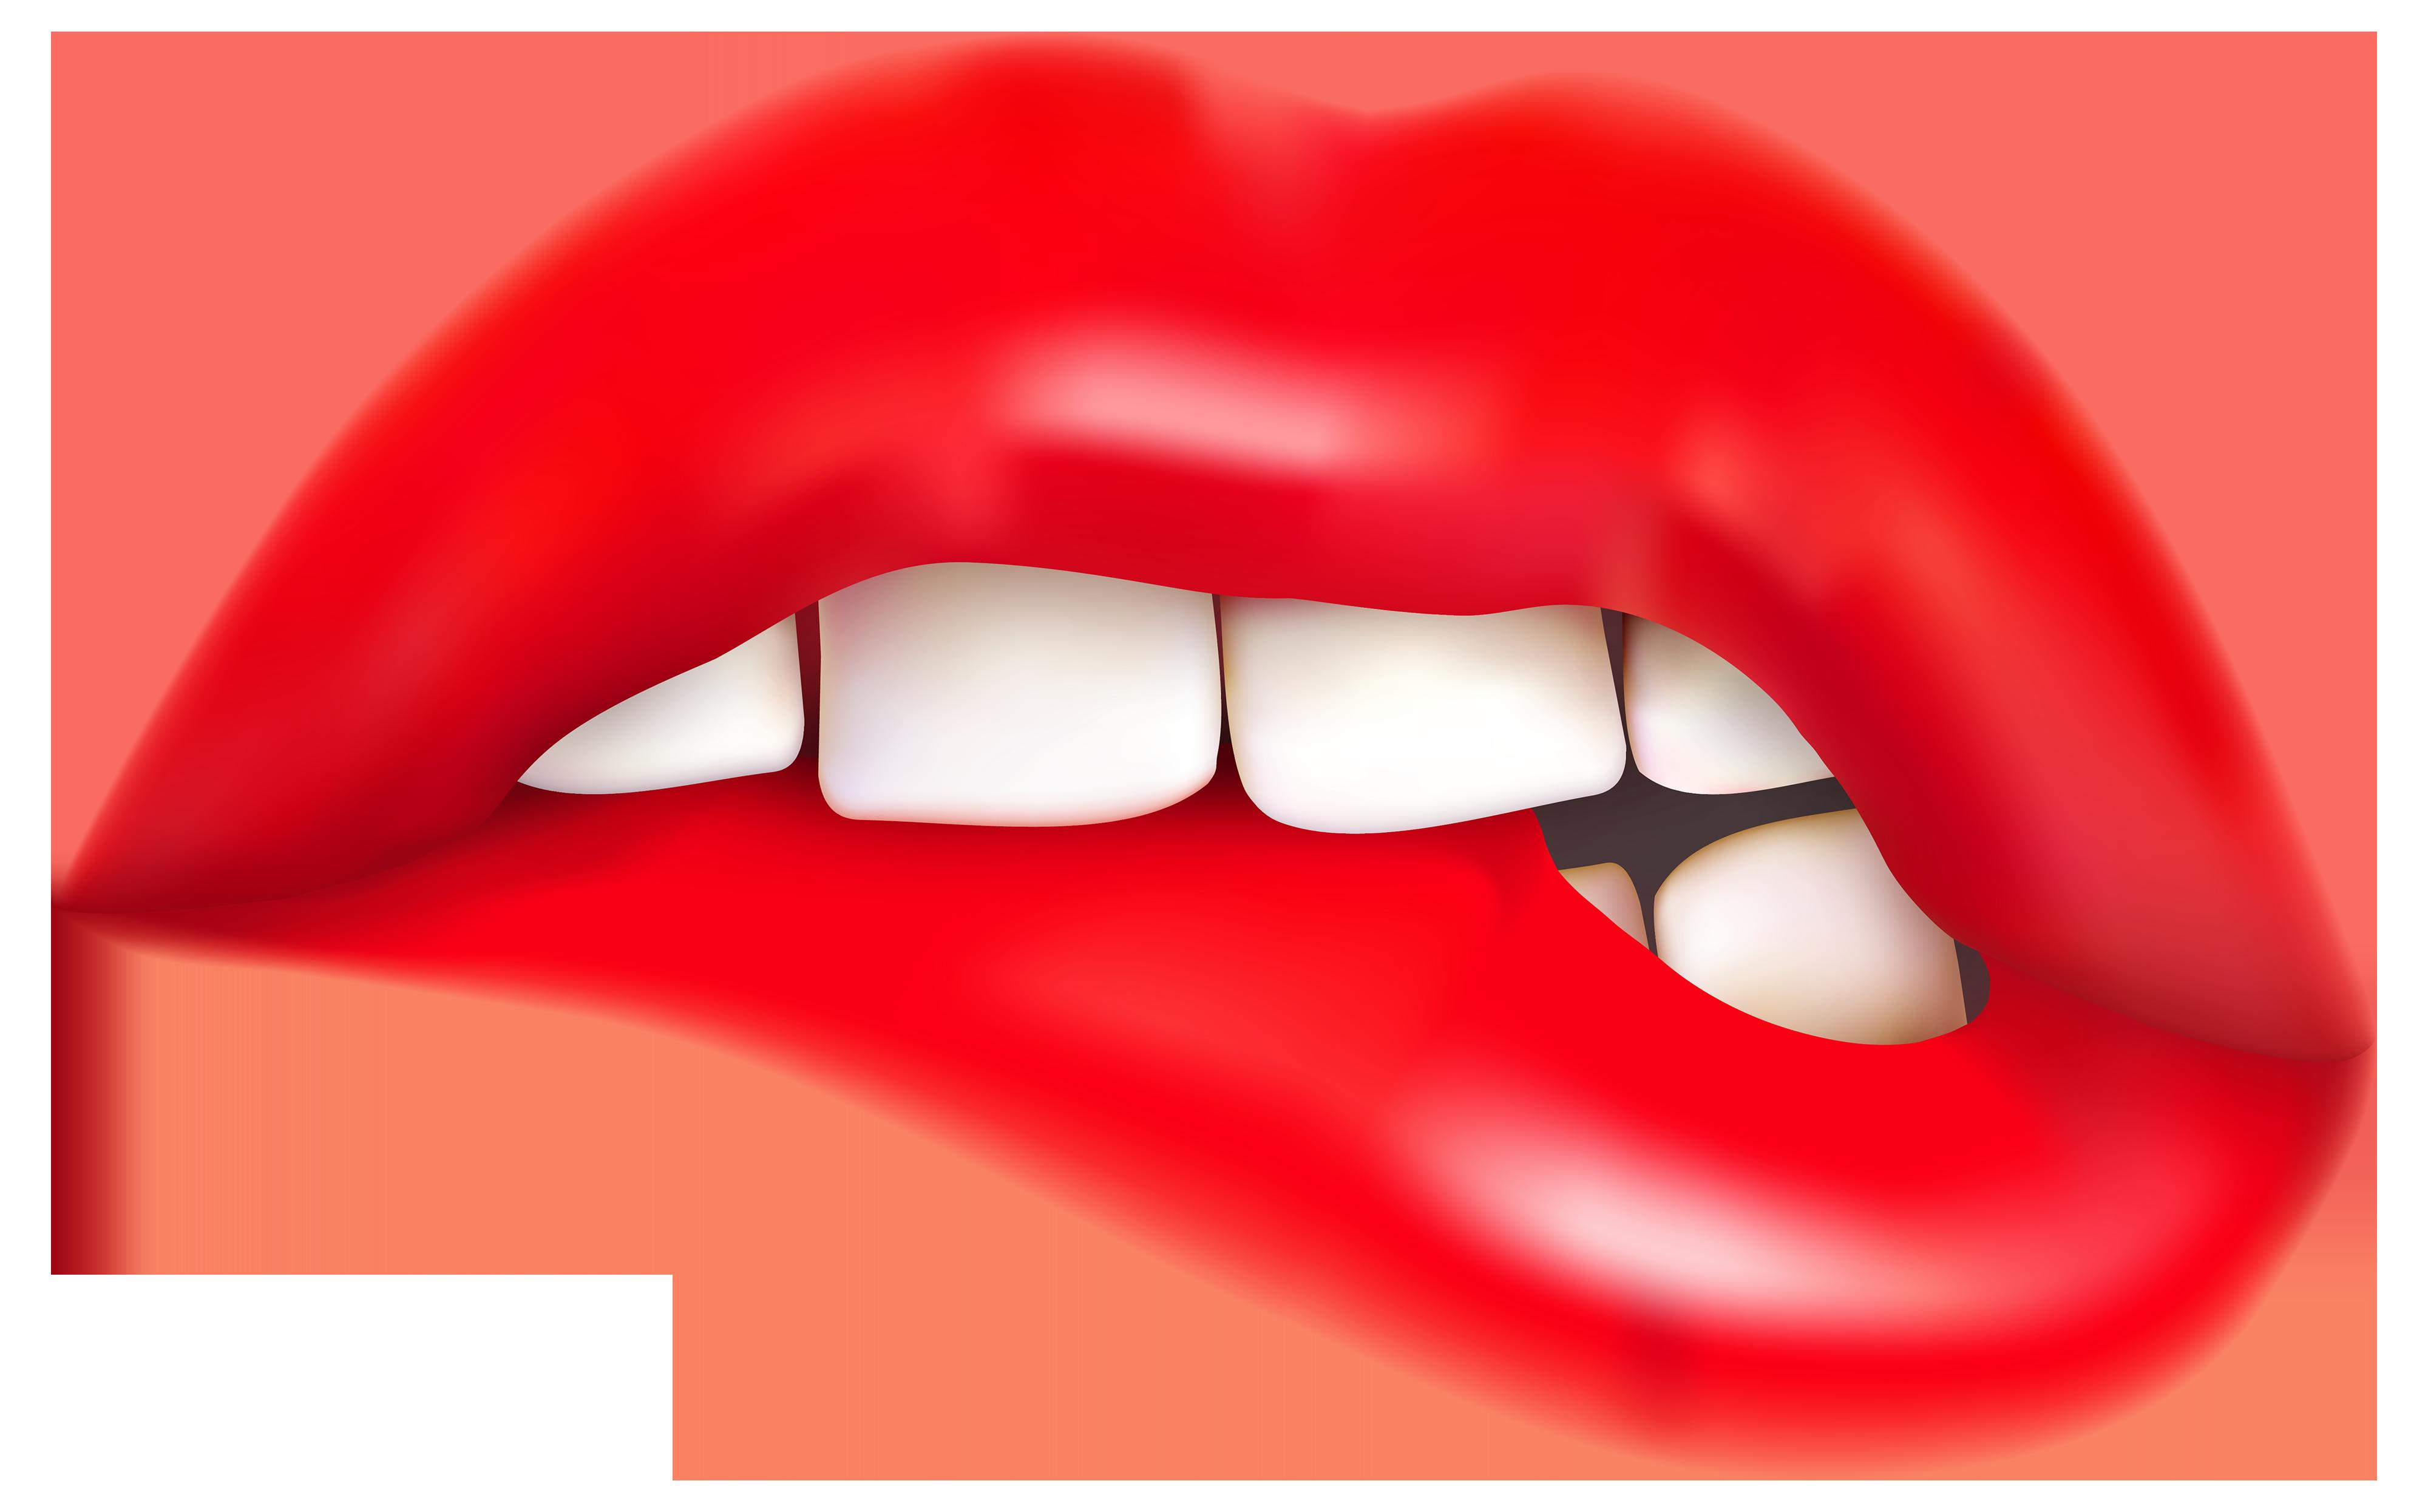 Lips Clipart at GetDrawings.com.